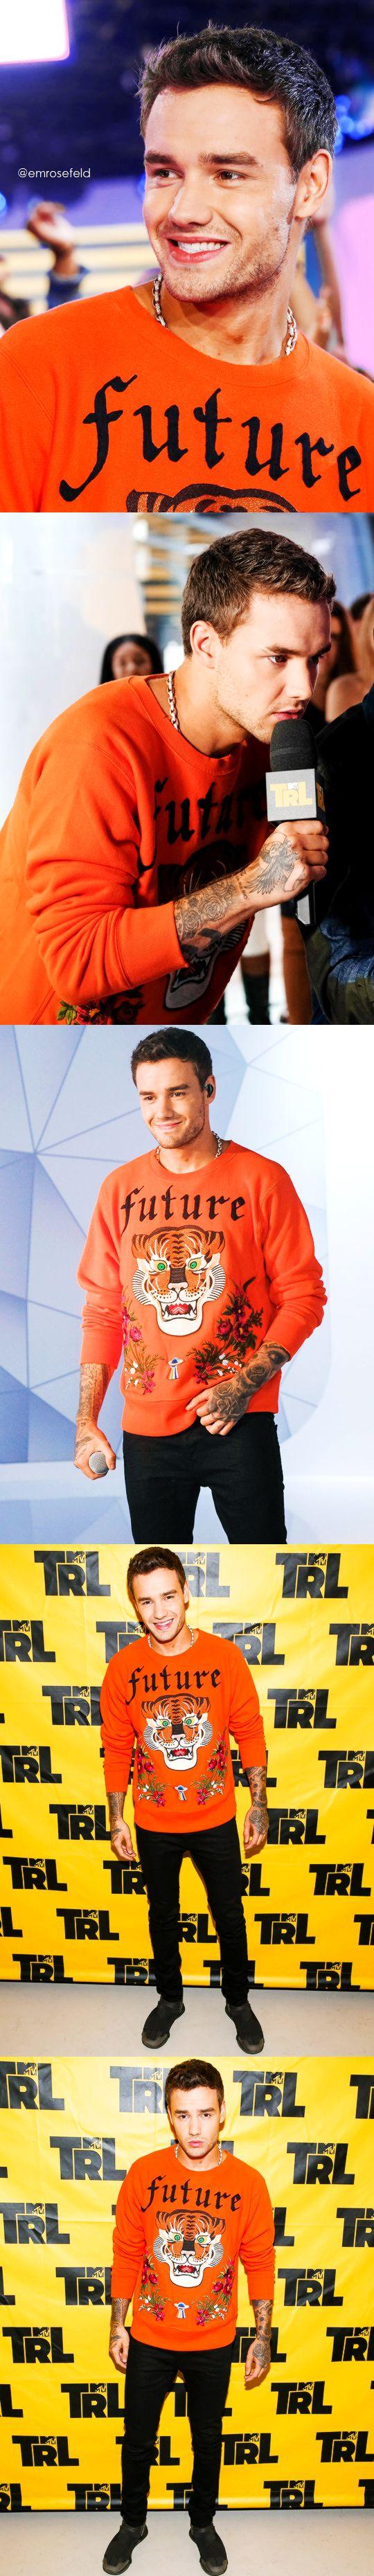 Liam Payne | at MTV Studios 10.11.17 | emrosefeld |